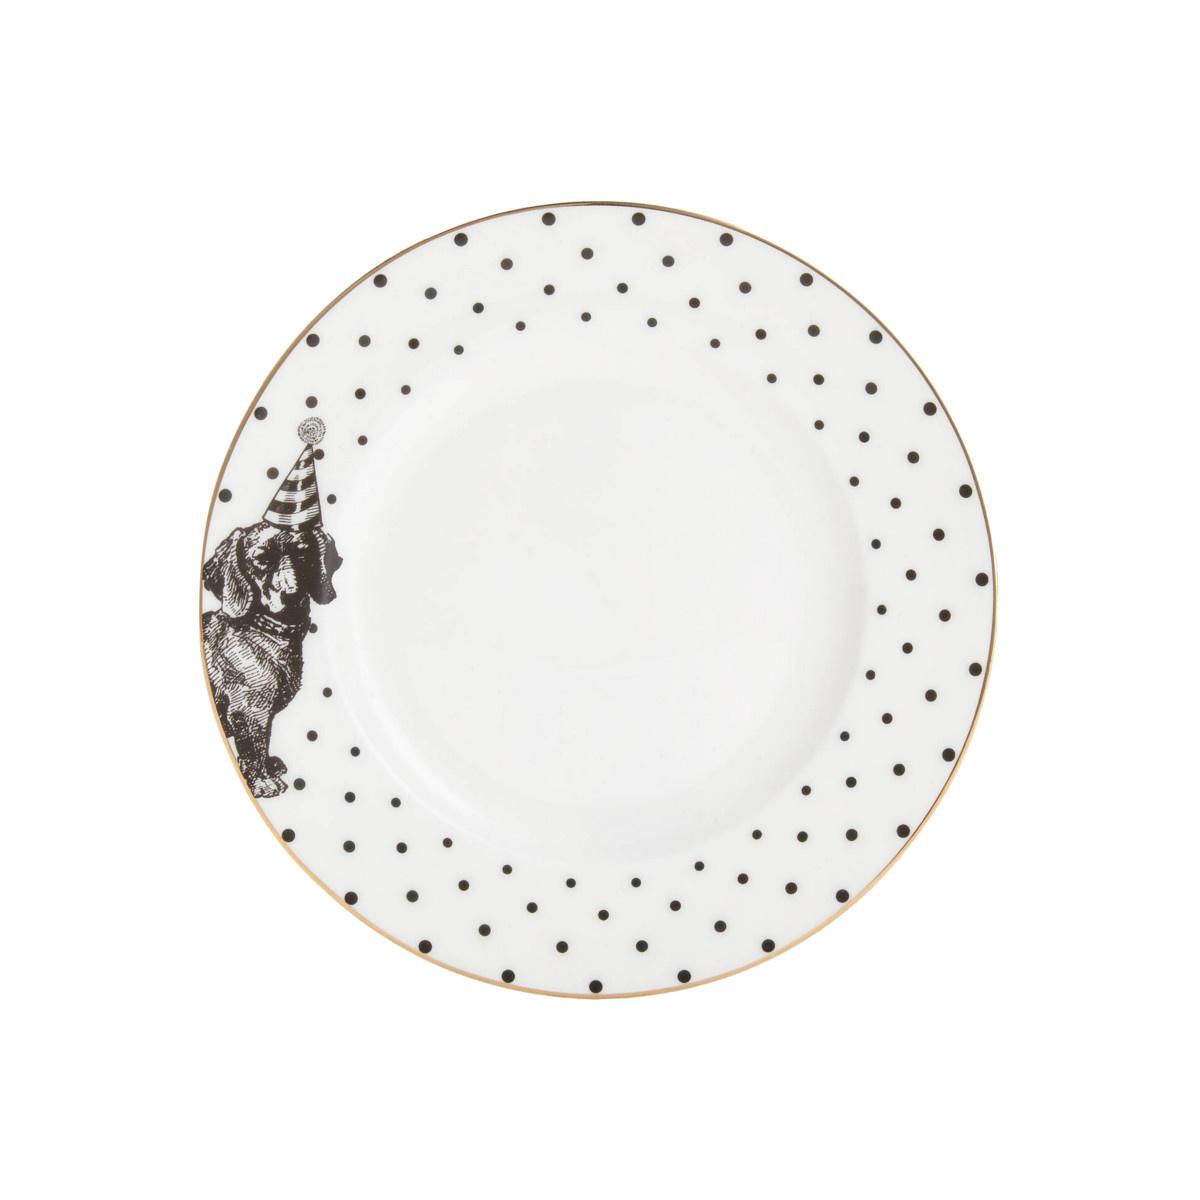 Yvonne Ellen London Monochrome Set of 4 Plates Ø 16 cm - Animal Prints - Bone China - In Beautiful Giftbox